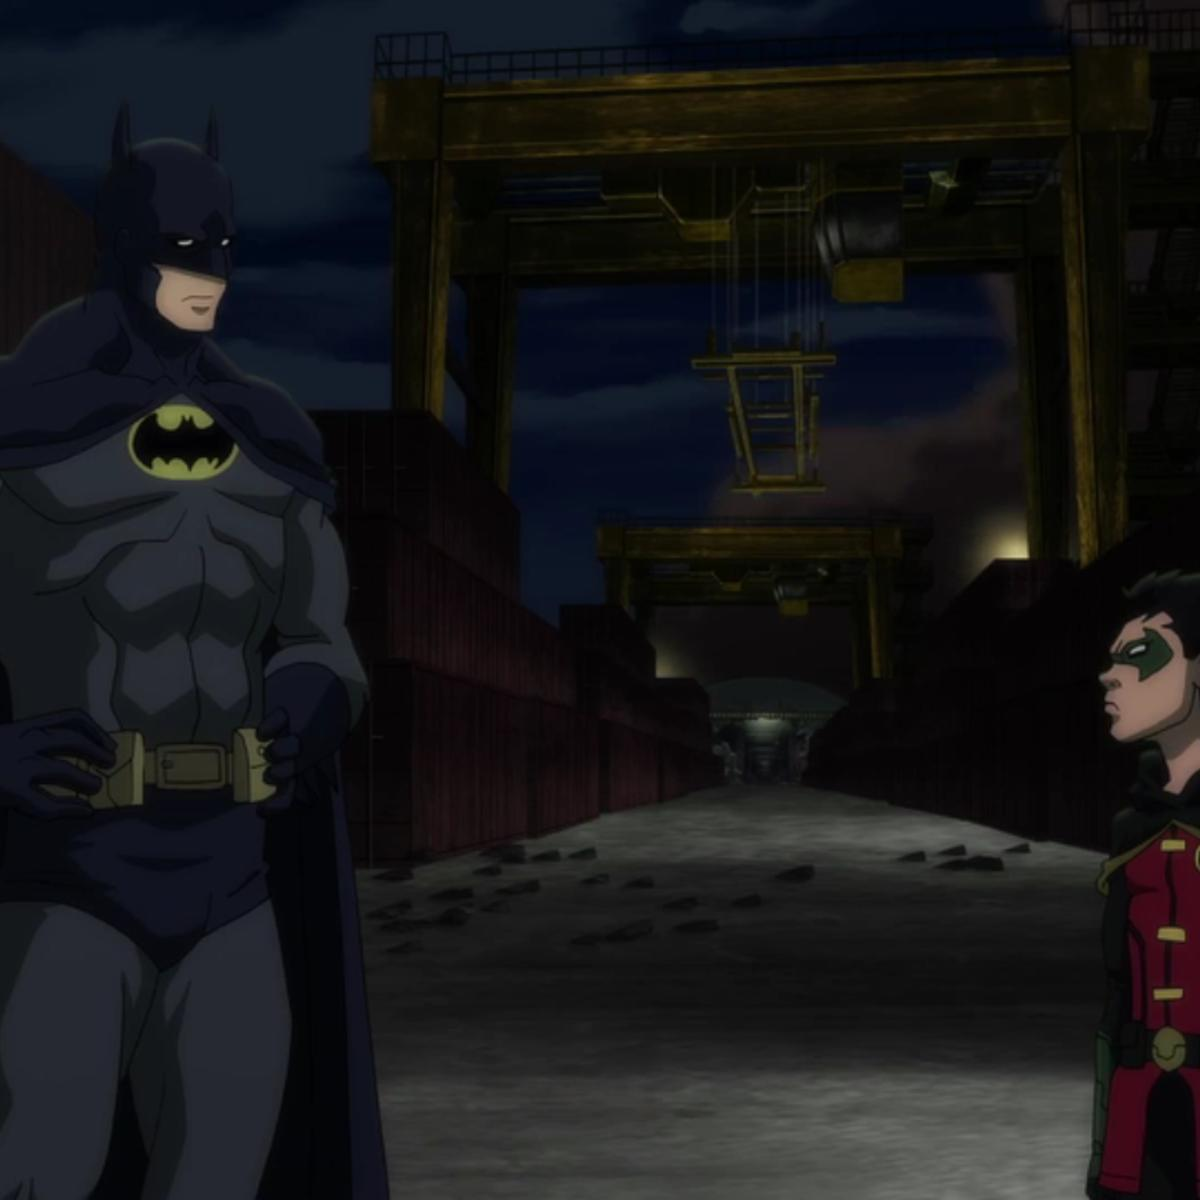 Batman-Bad-Blood-screenshot.png